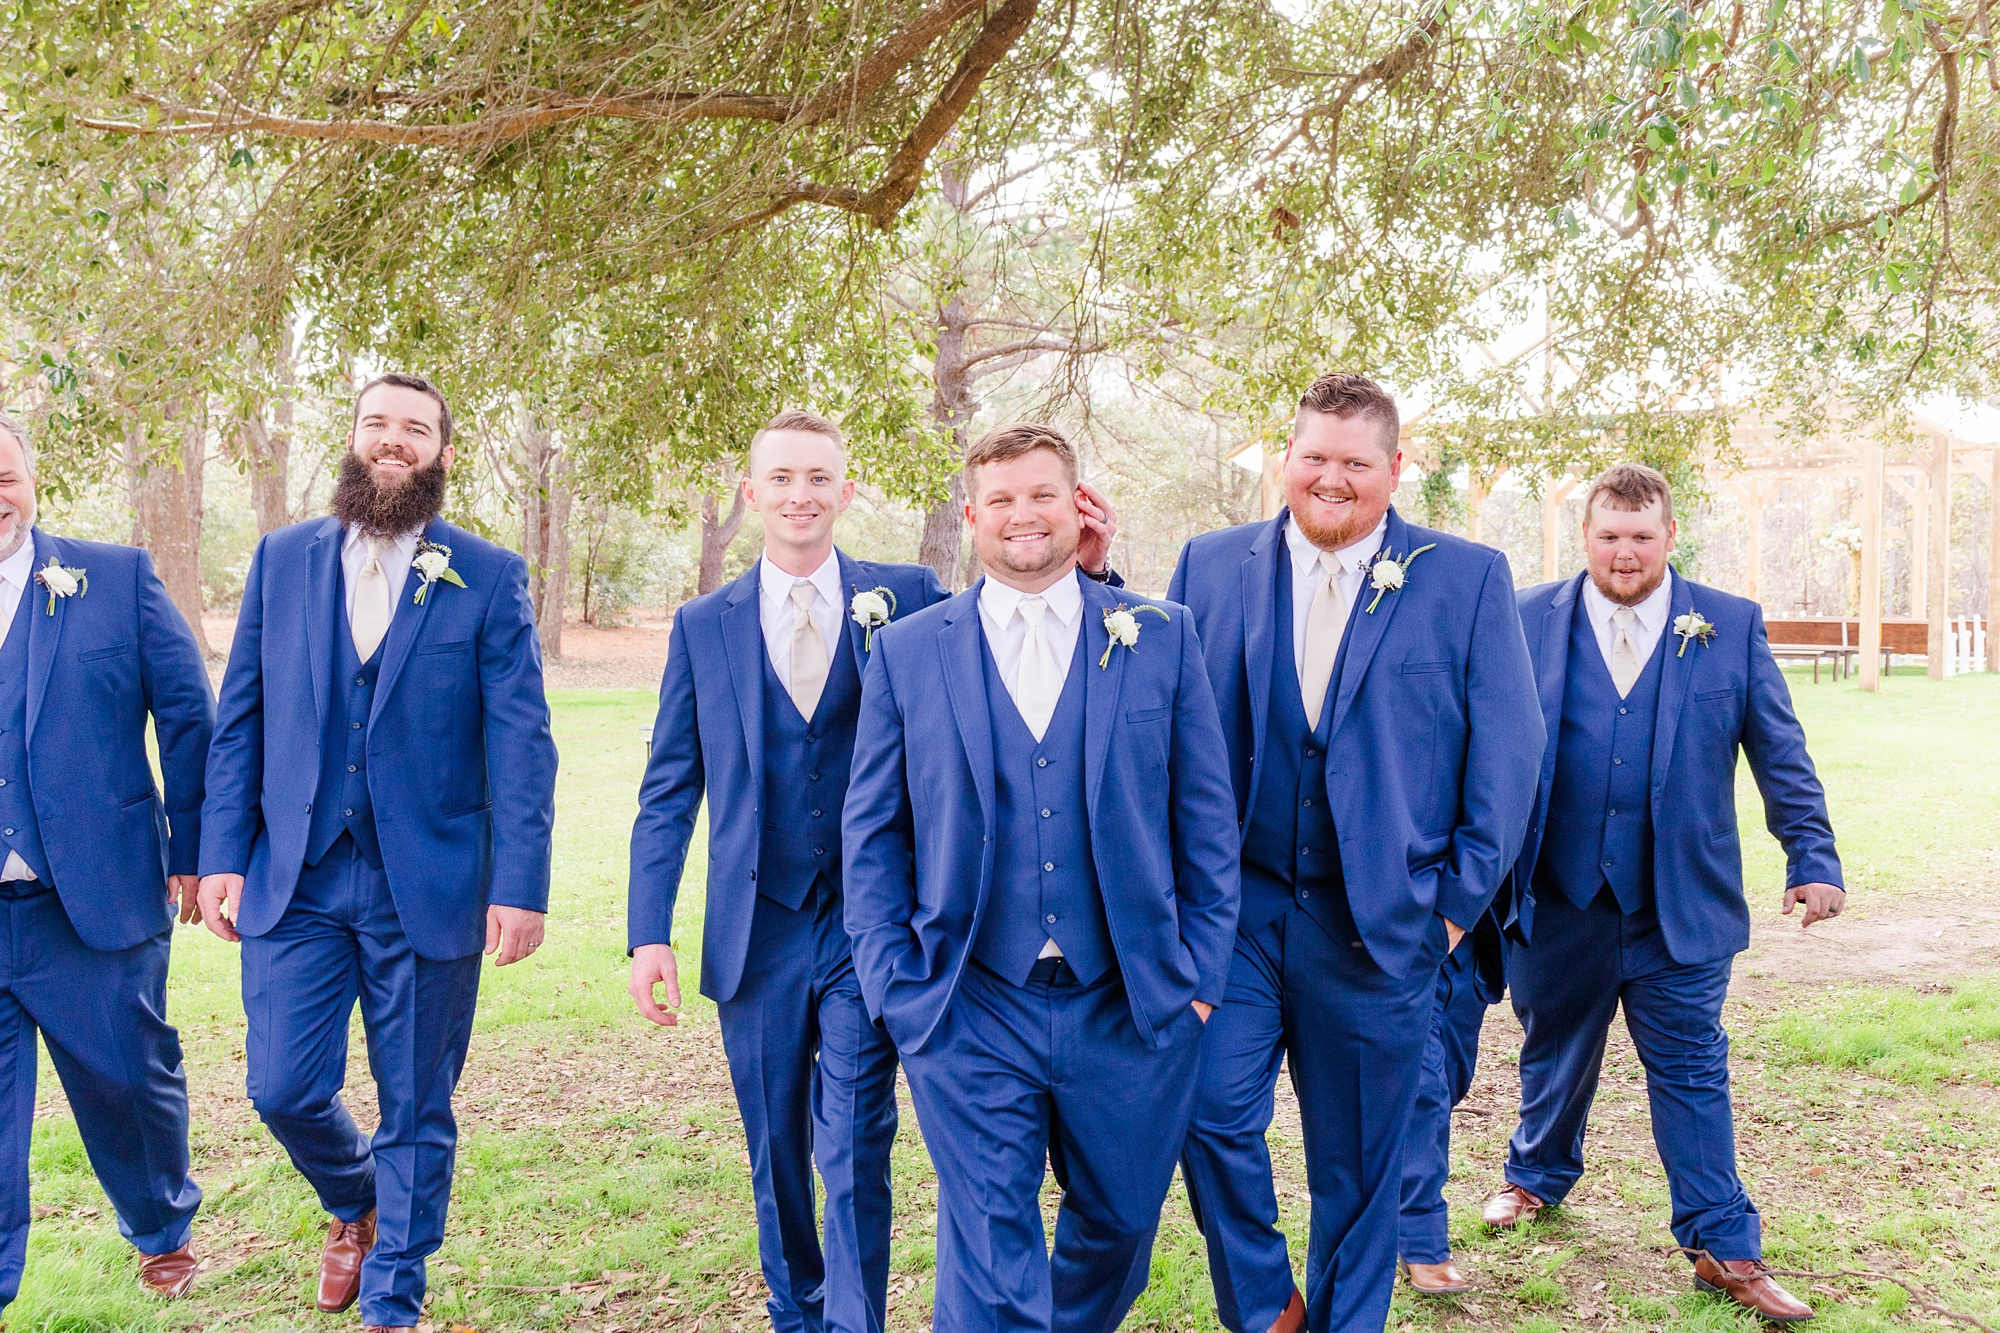 groom walks with groomsmen in blue jackets